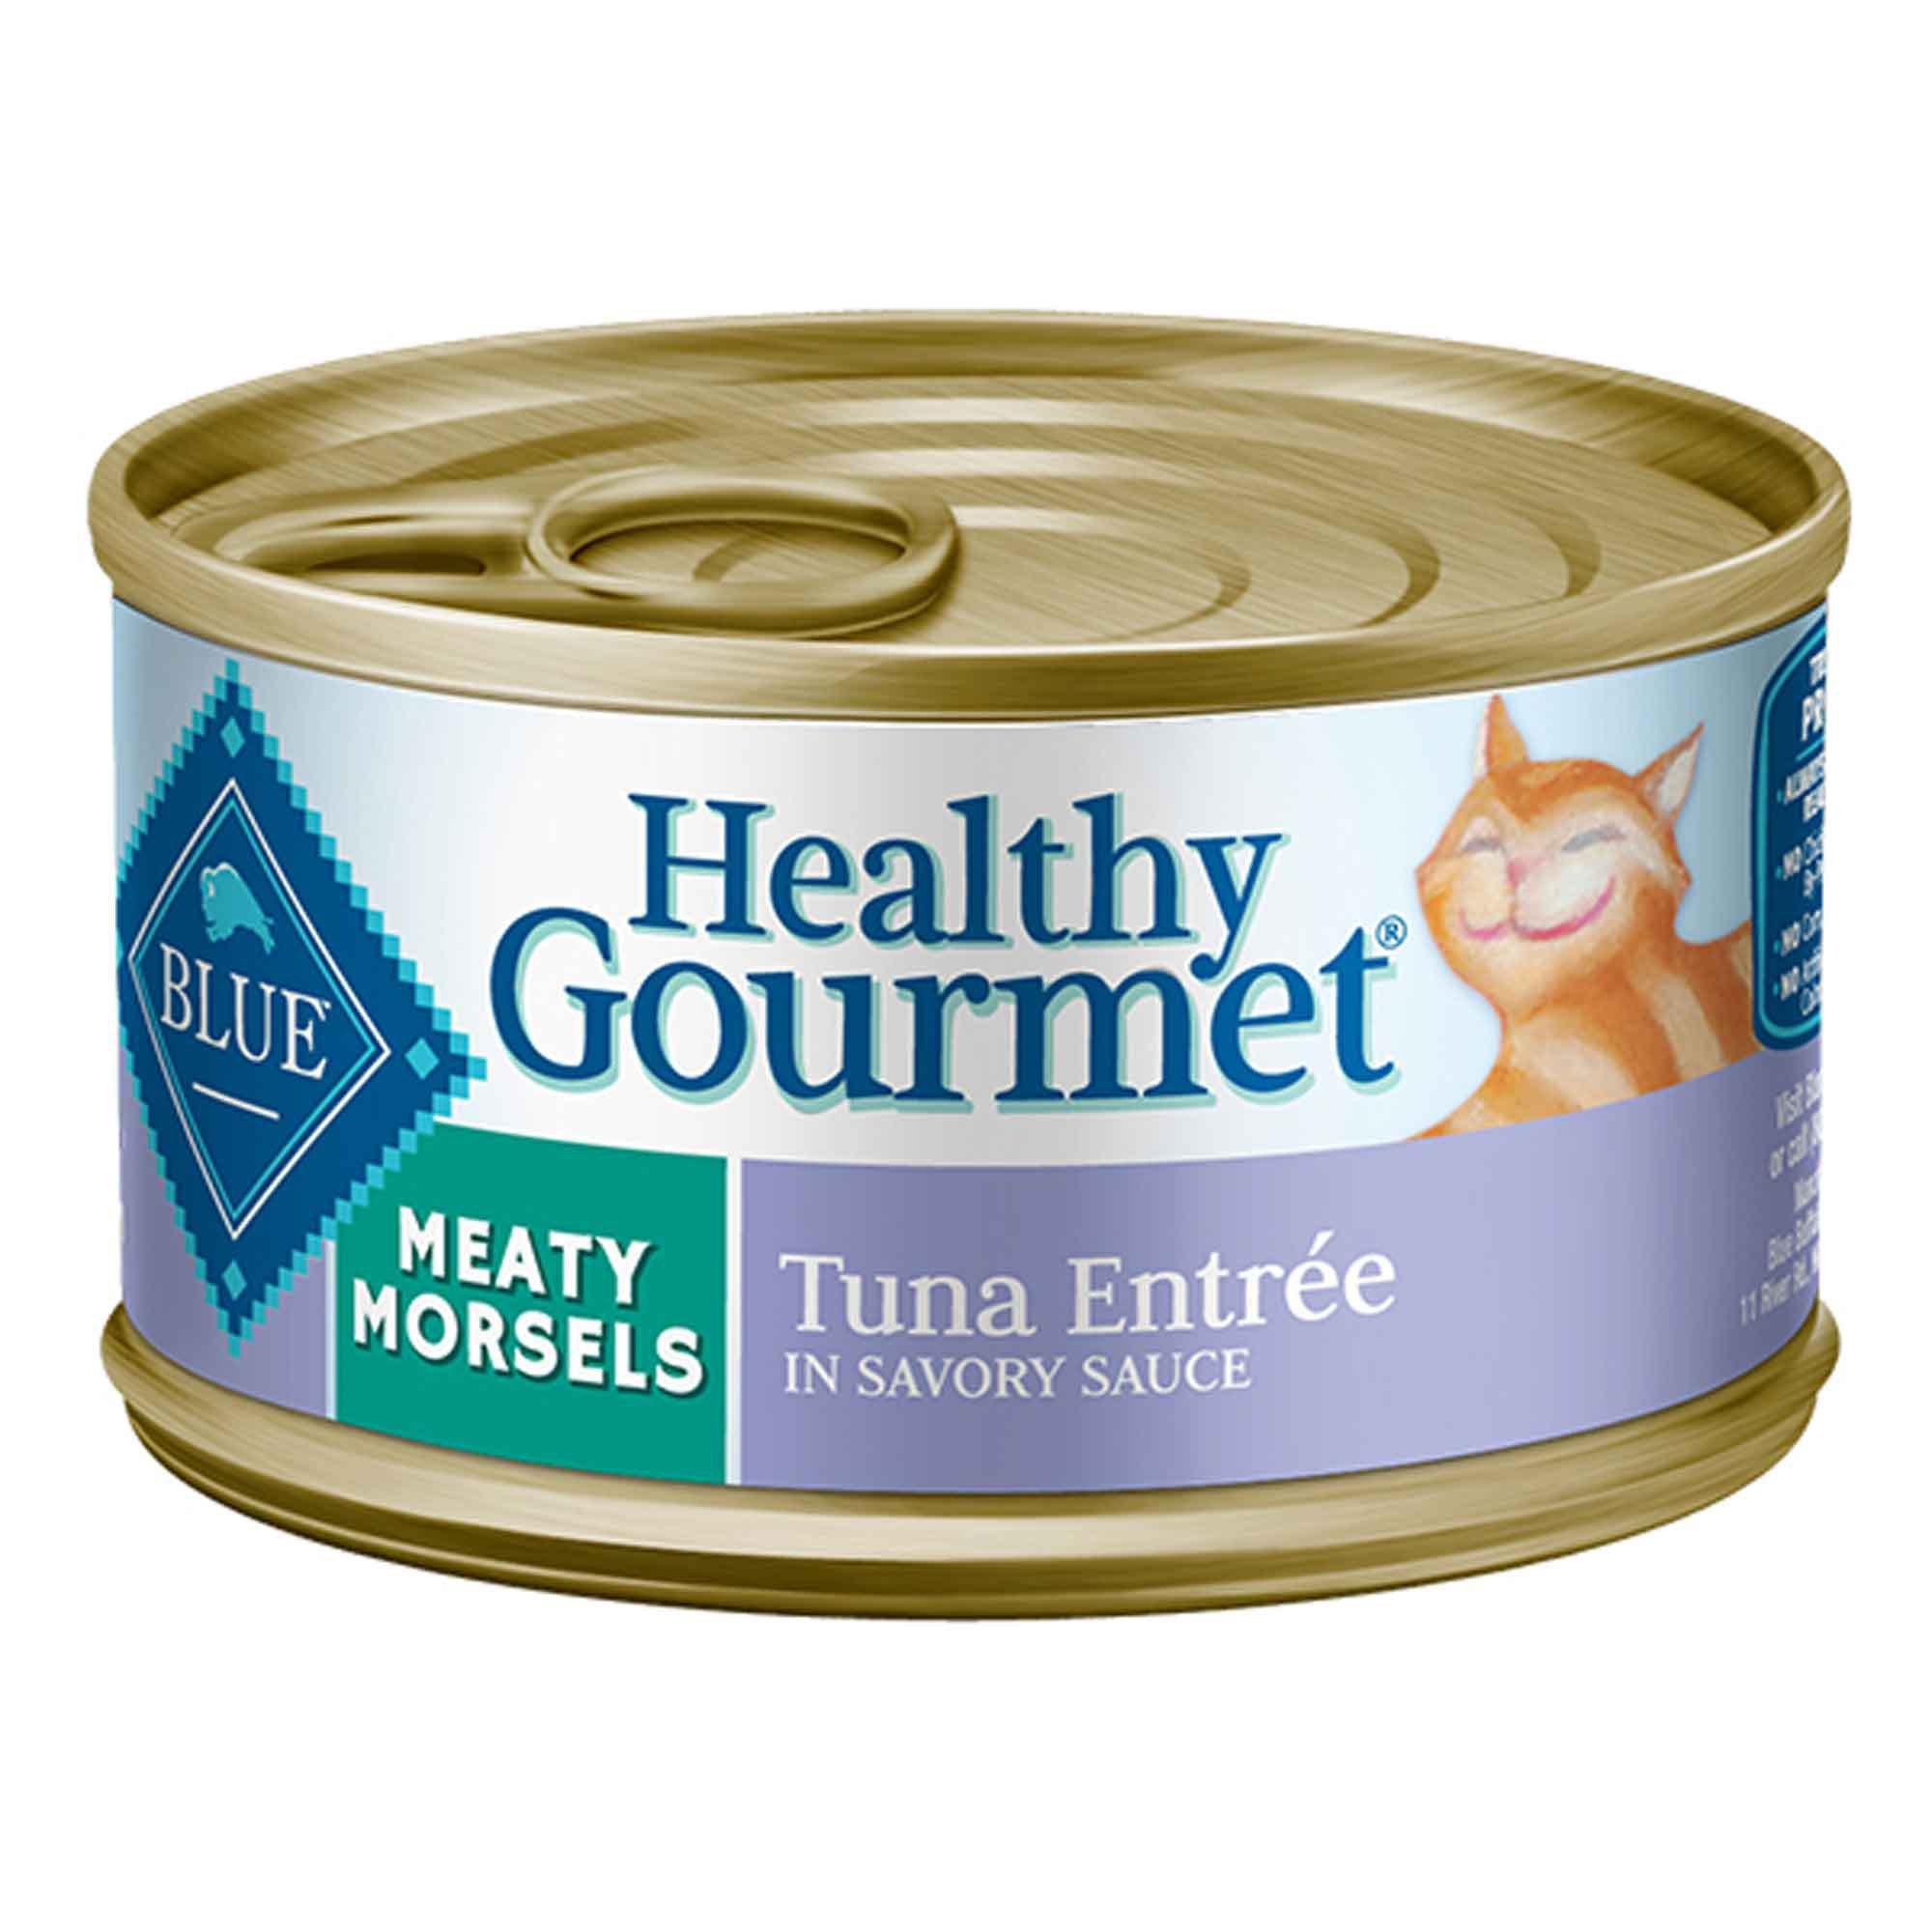 Blue Buffalo Healthy Gourmet Meaty Morsels Tuna Adult Canned Cat Food